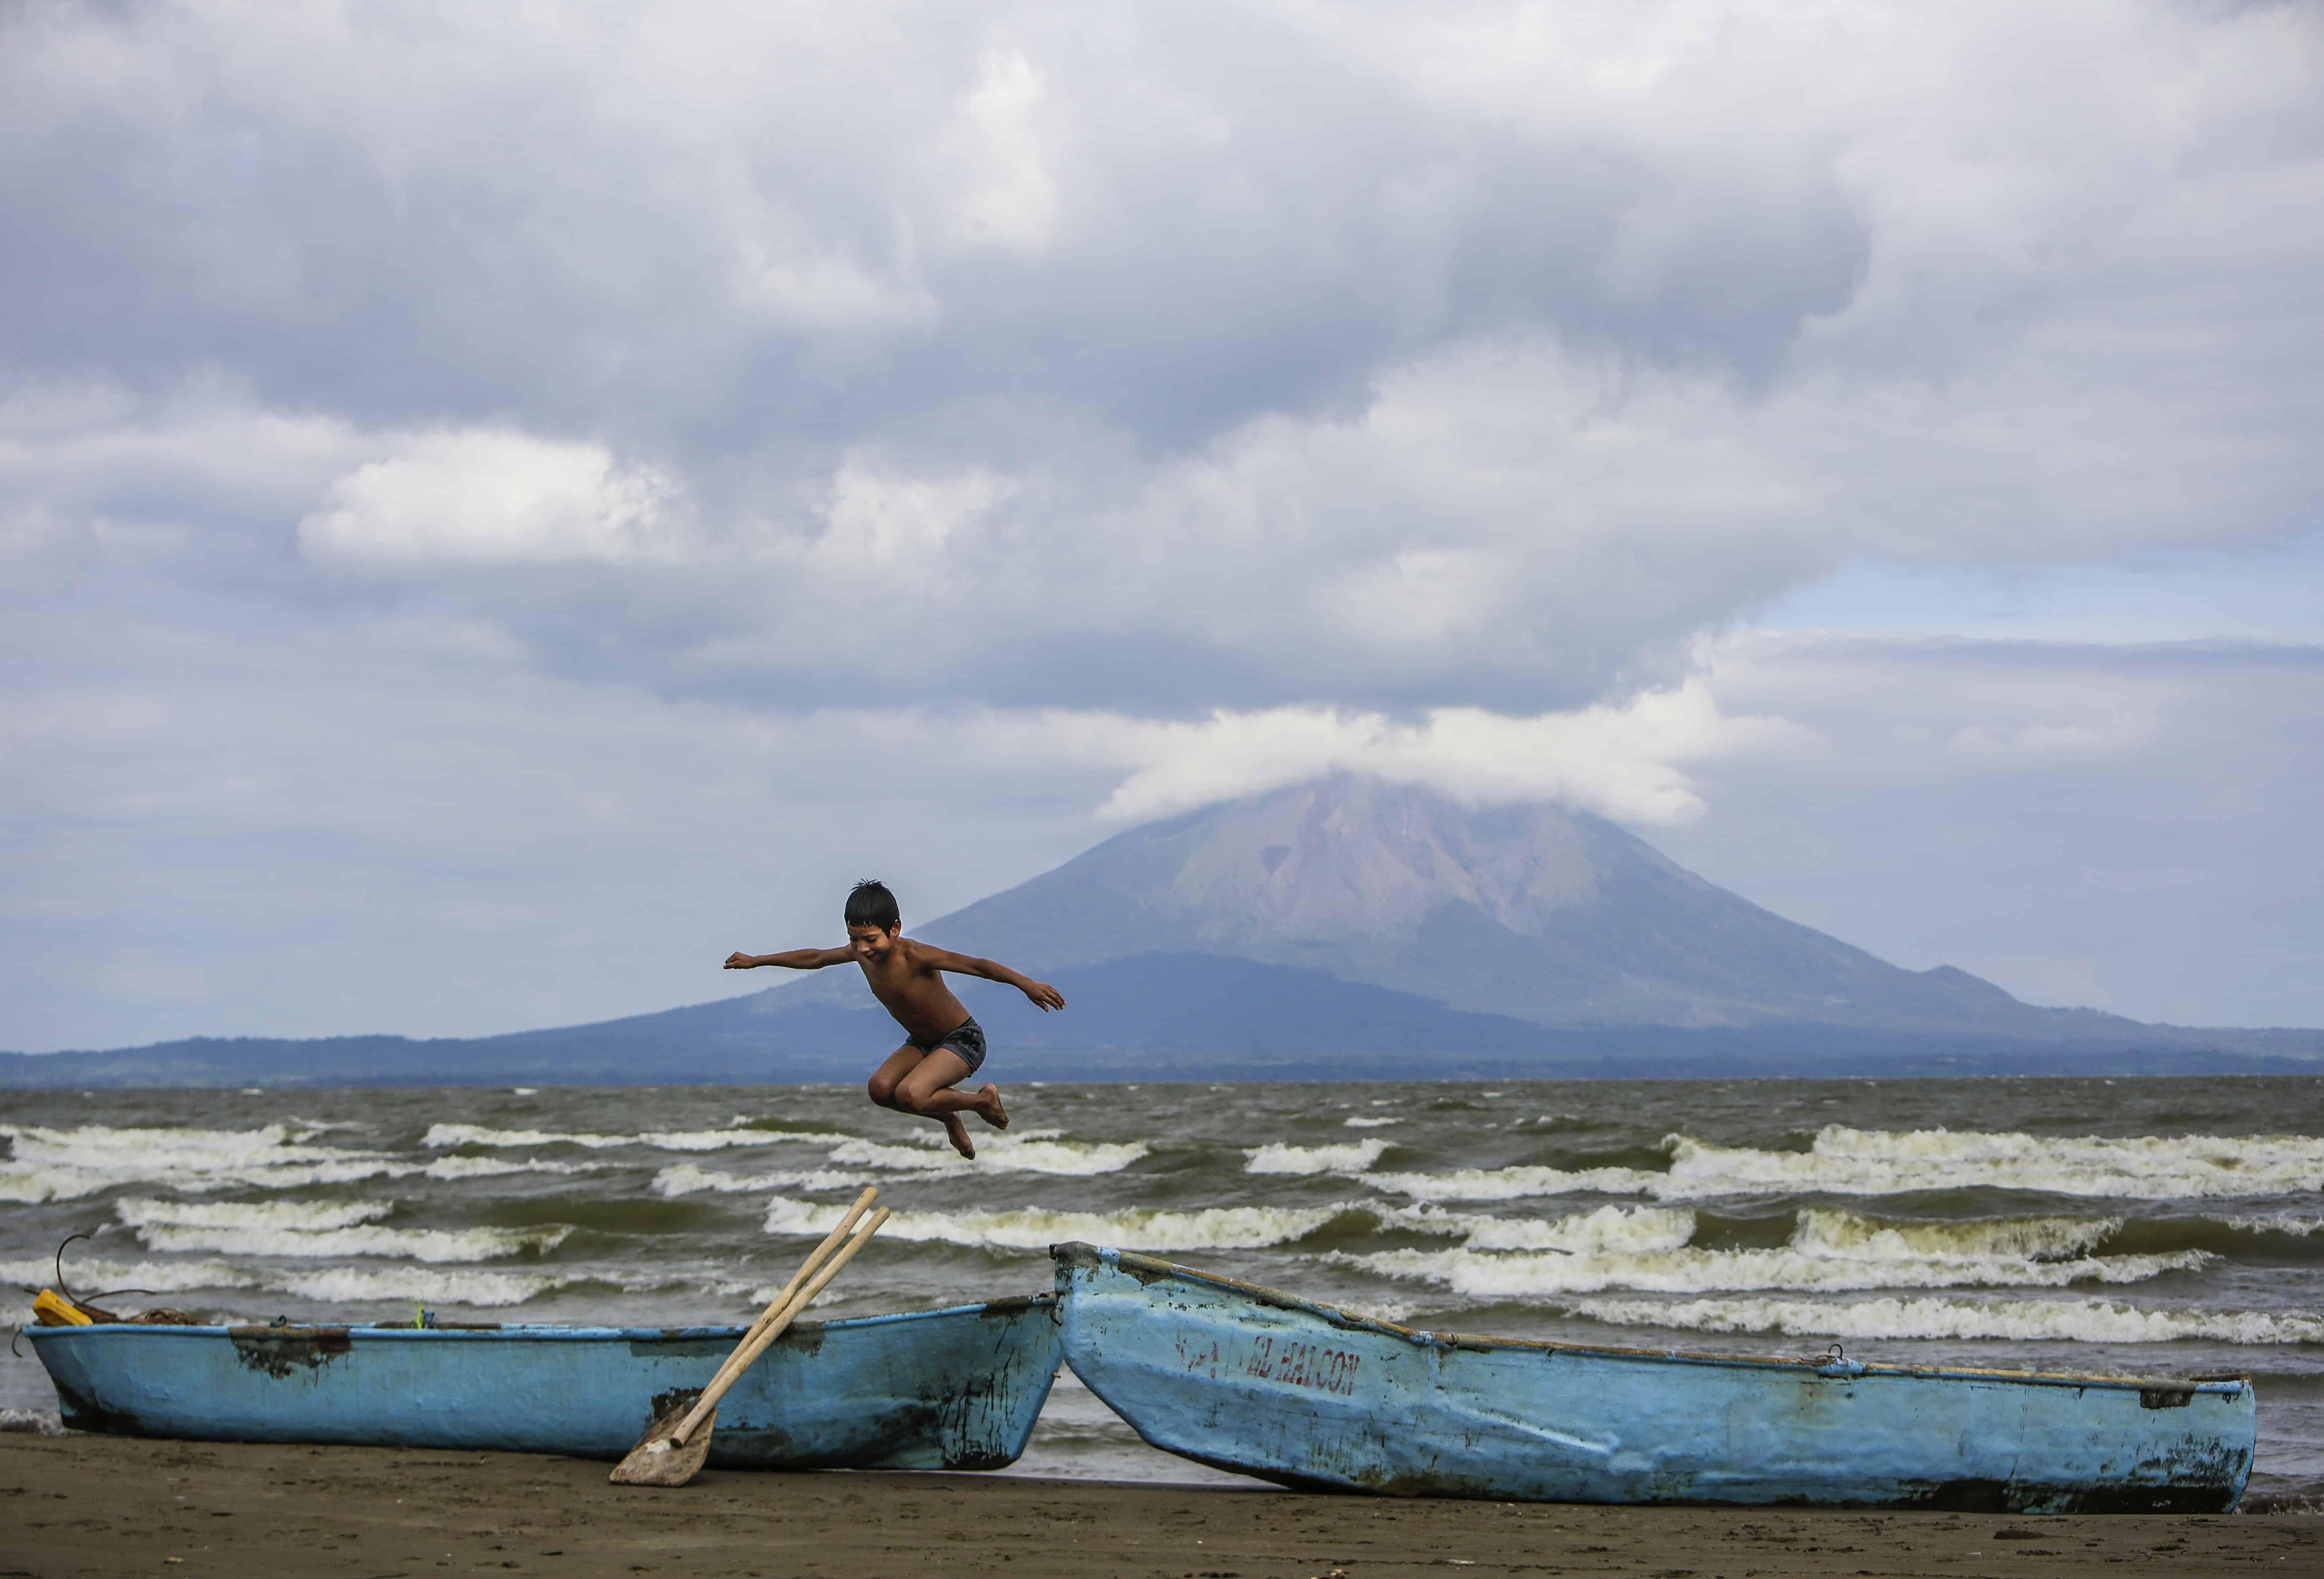 A young boy plays near two fishing boats along the shore of Lake Cocibolca in Rivas, Nicaragua.